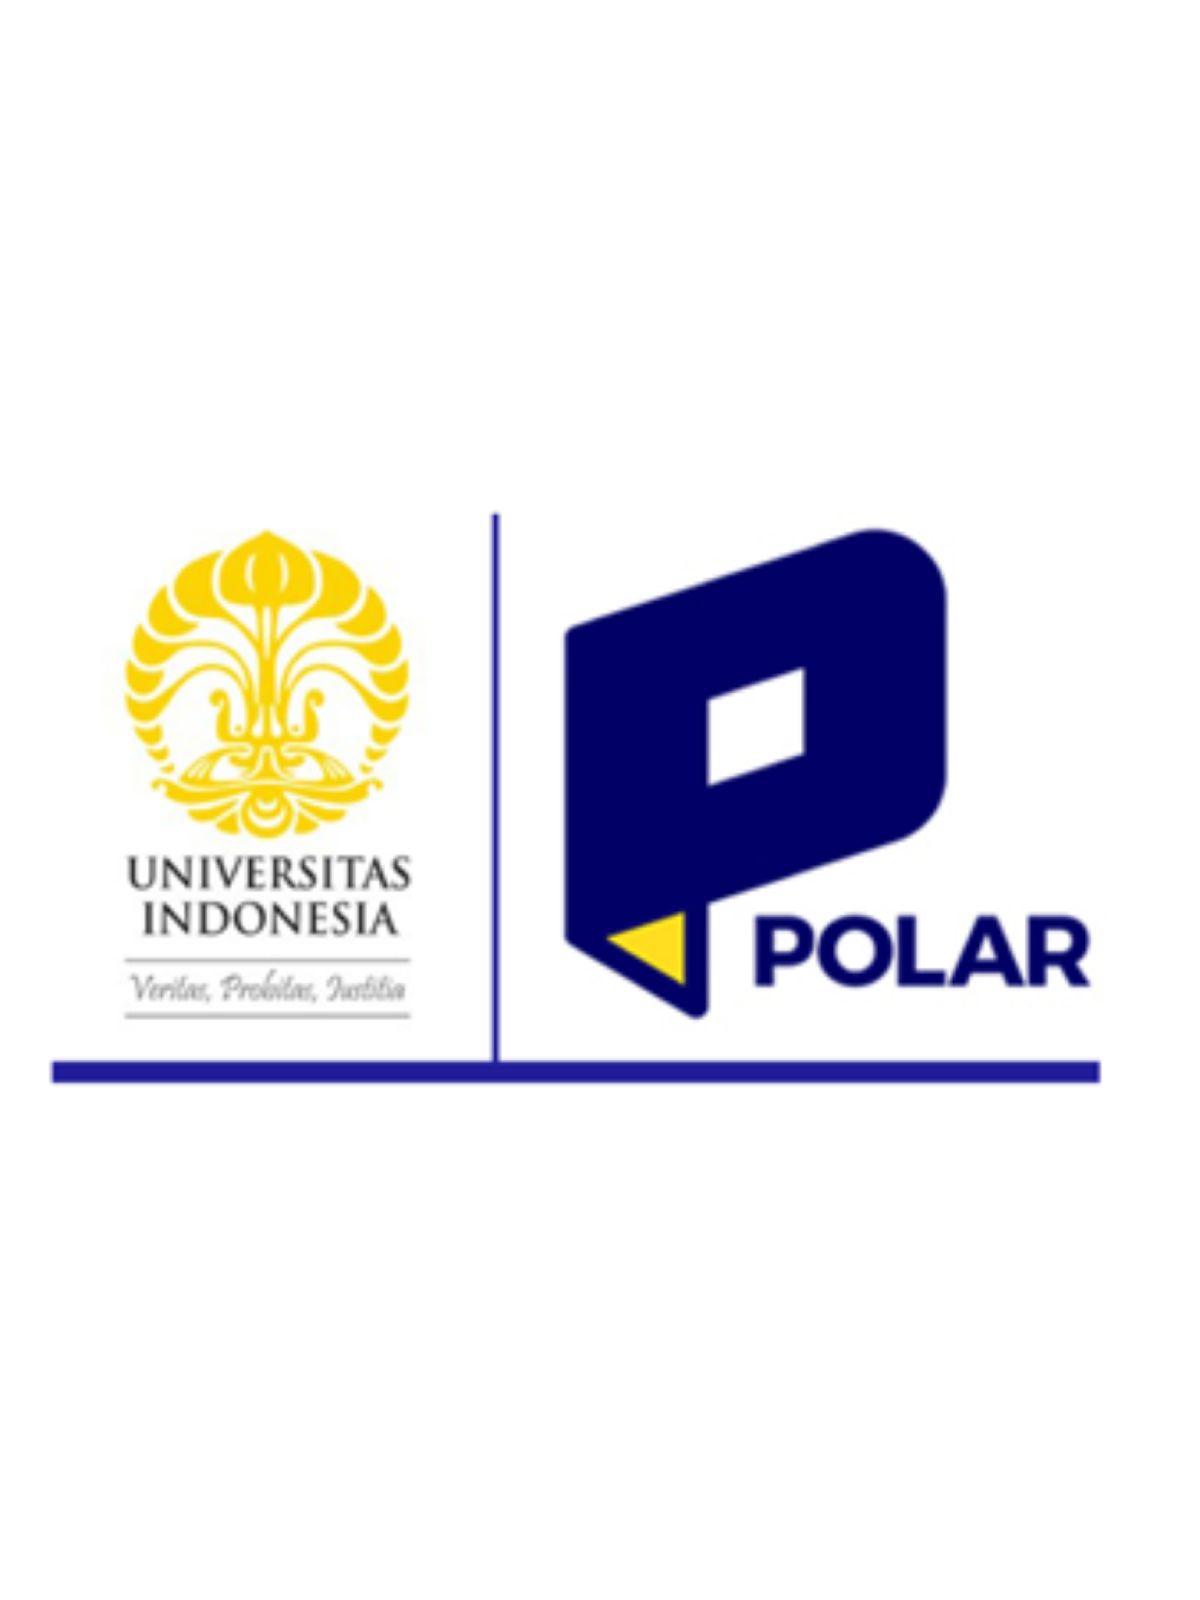 POLAR-Universitas Indonesia